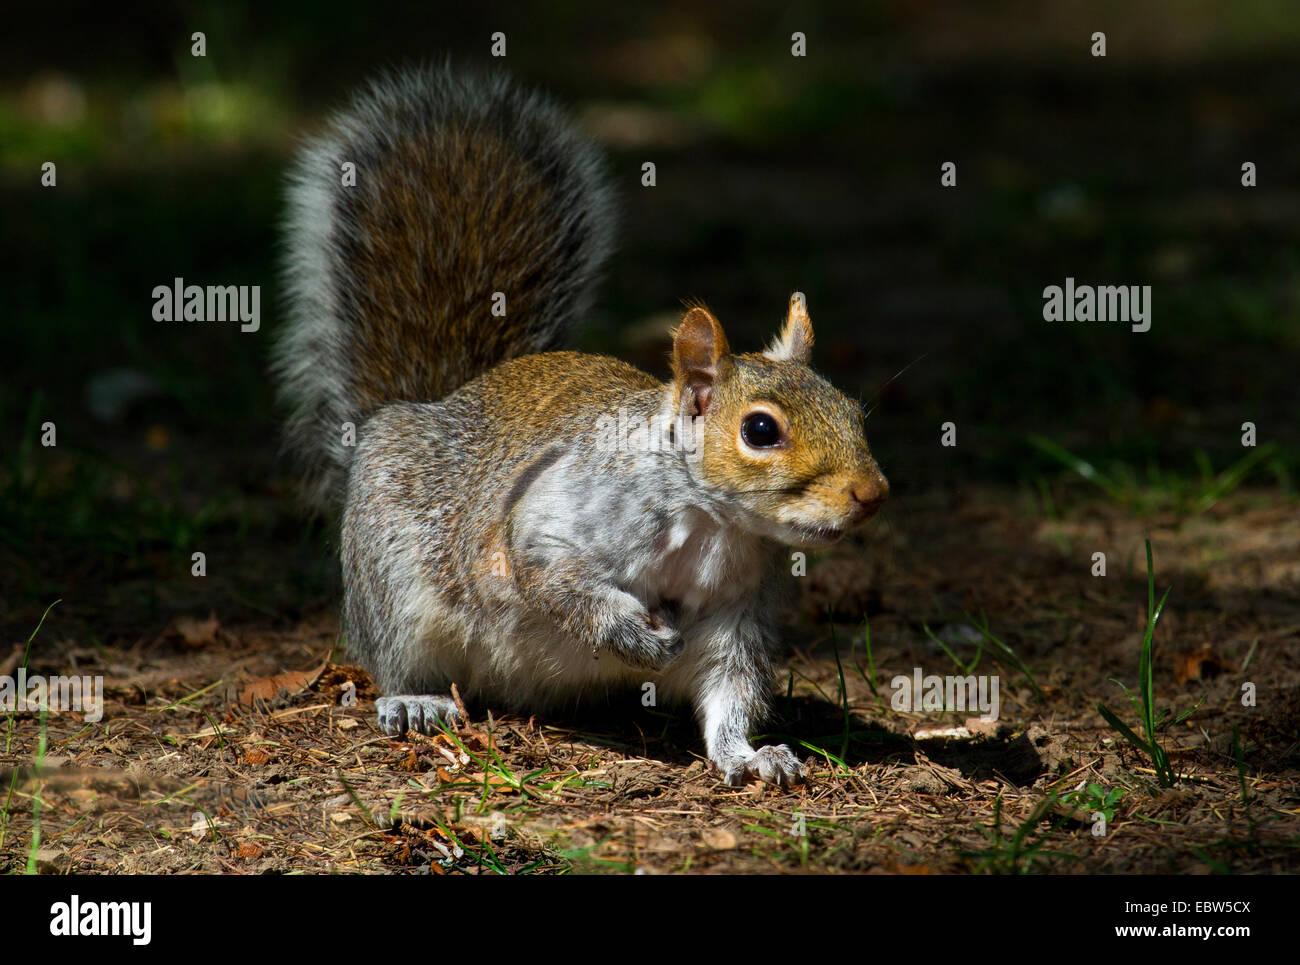 eastern gray squirrel, grey squirrel (Sciurus carolinensis), sitting on forest ground, United Kingdom, England Stock Photo